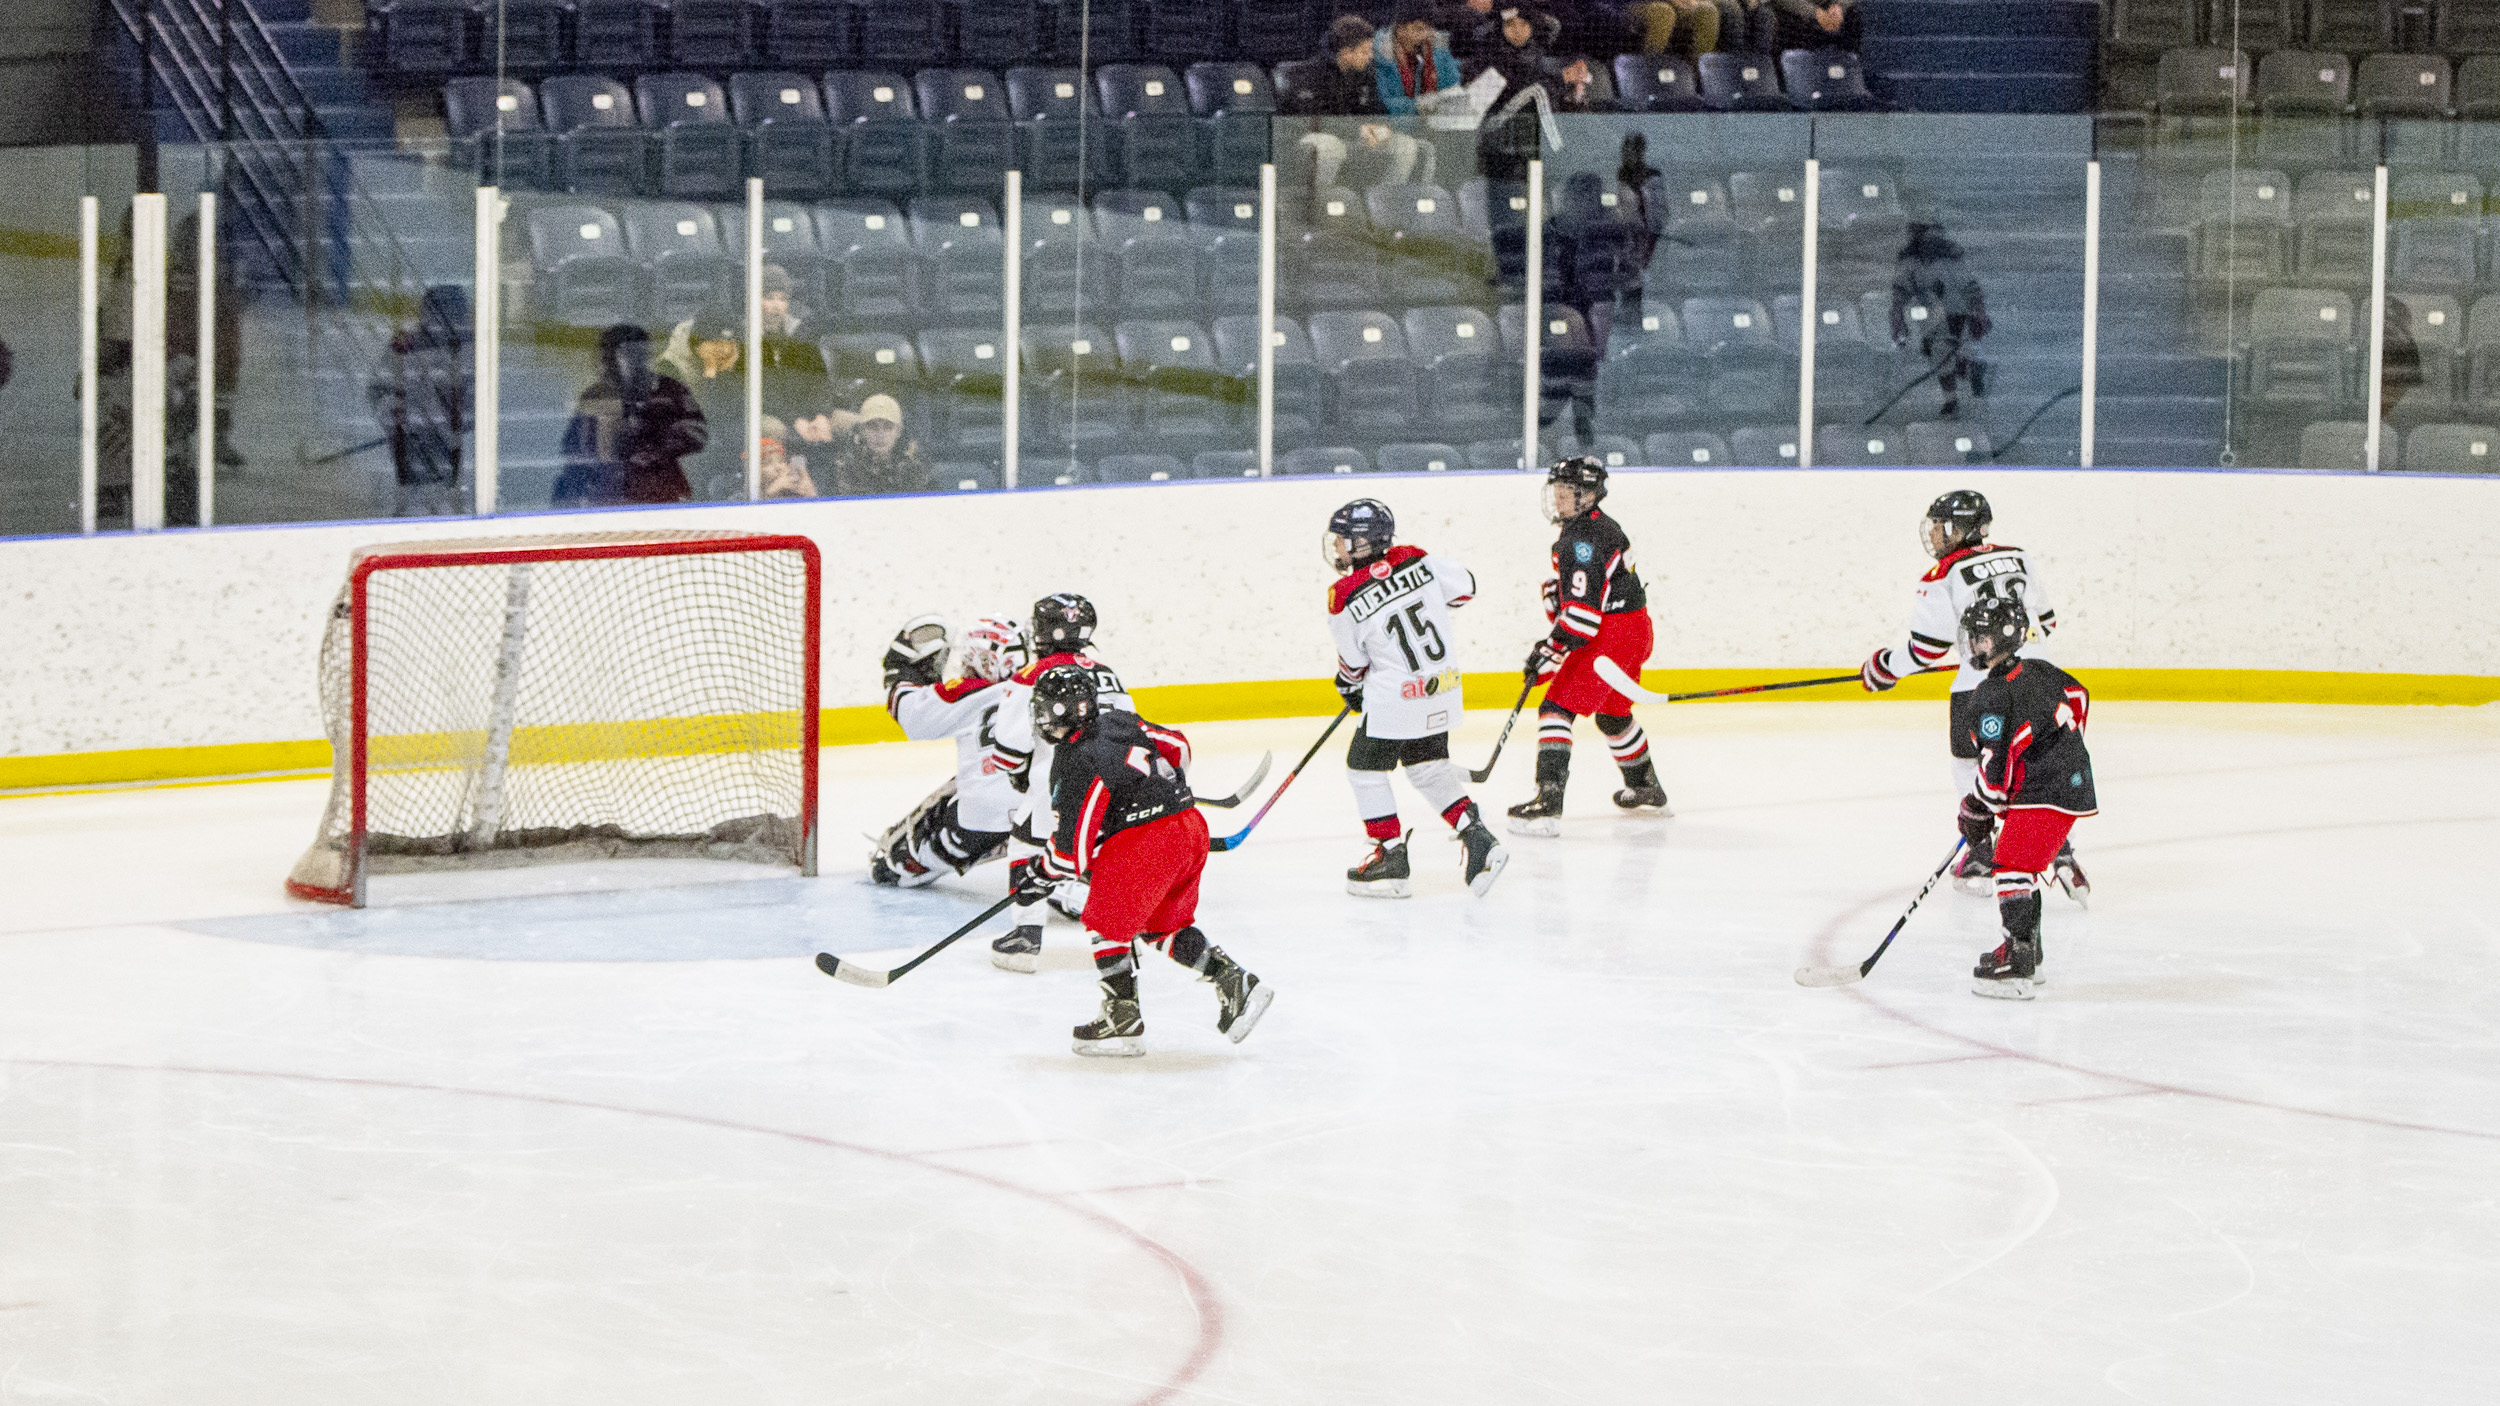 Tournoi Denis Labrie Hockey Matane